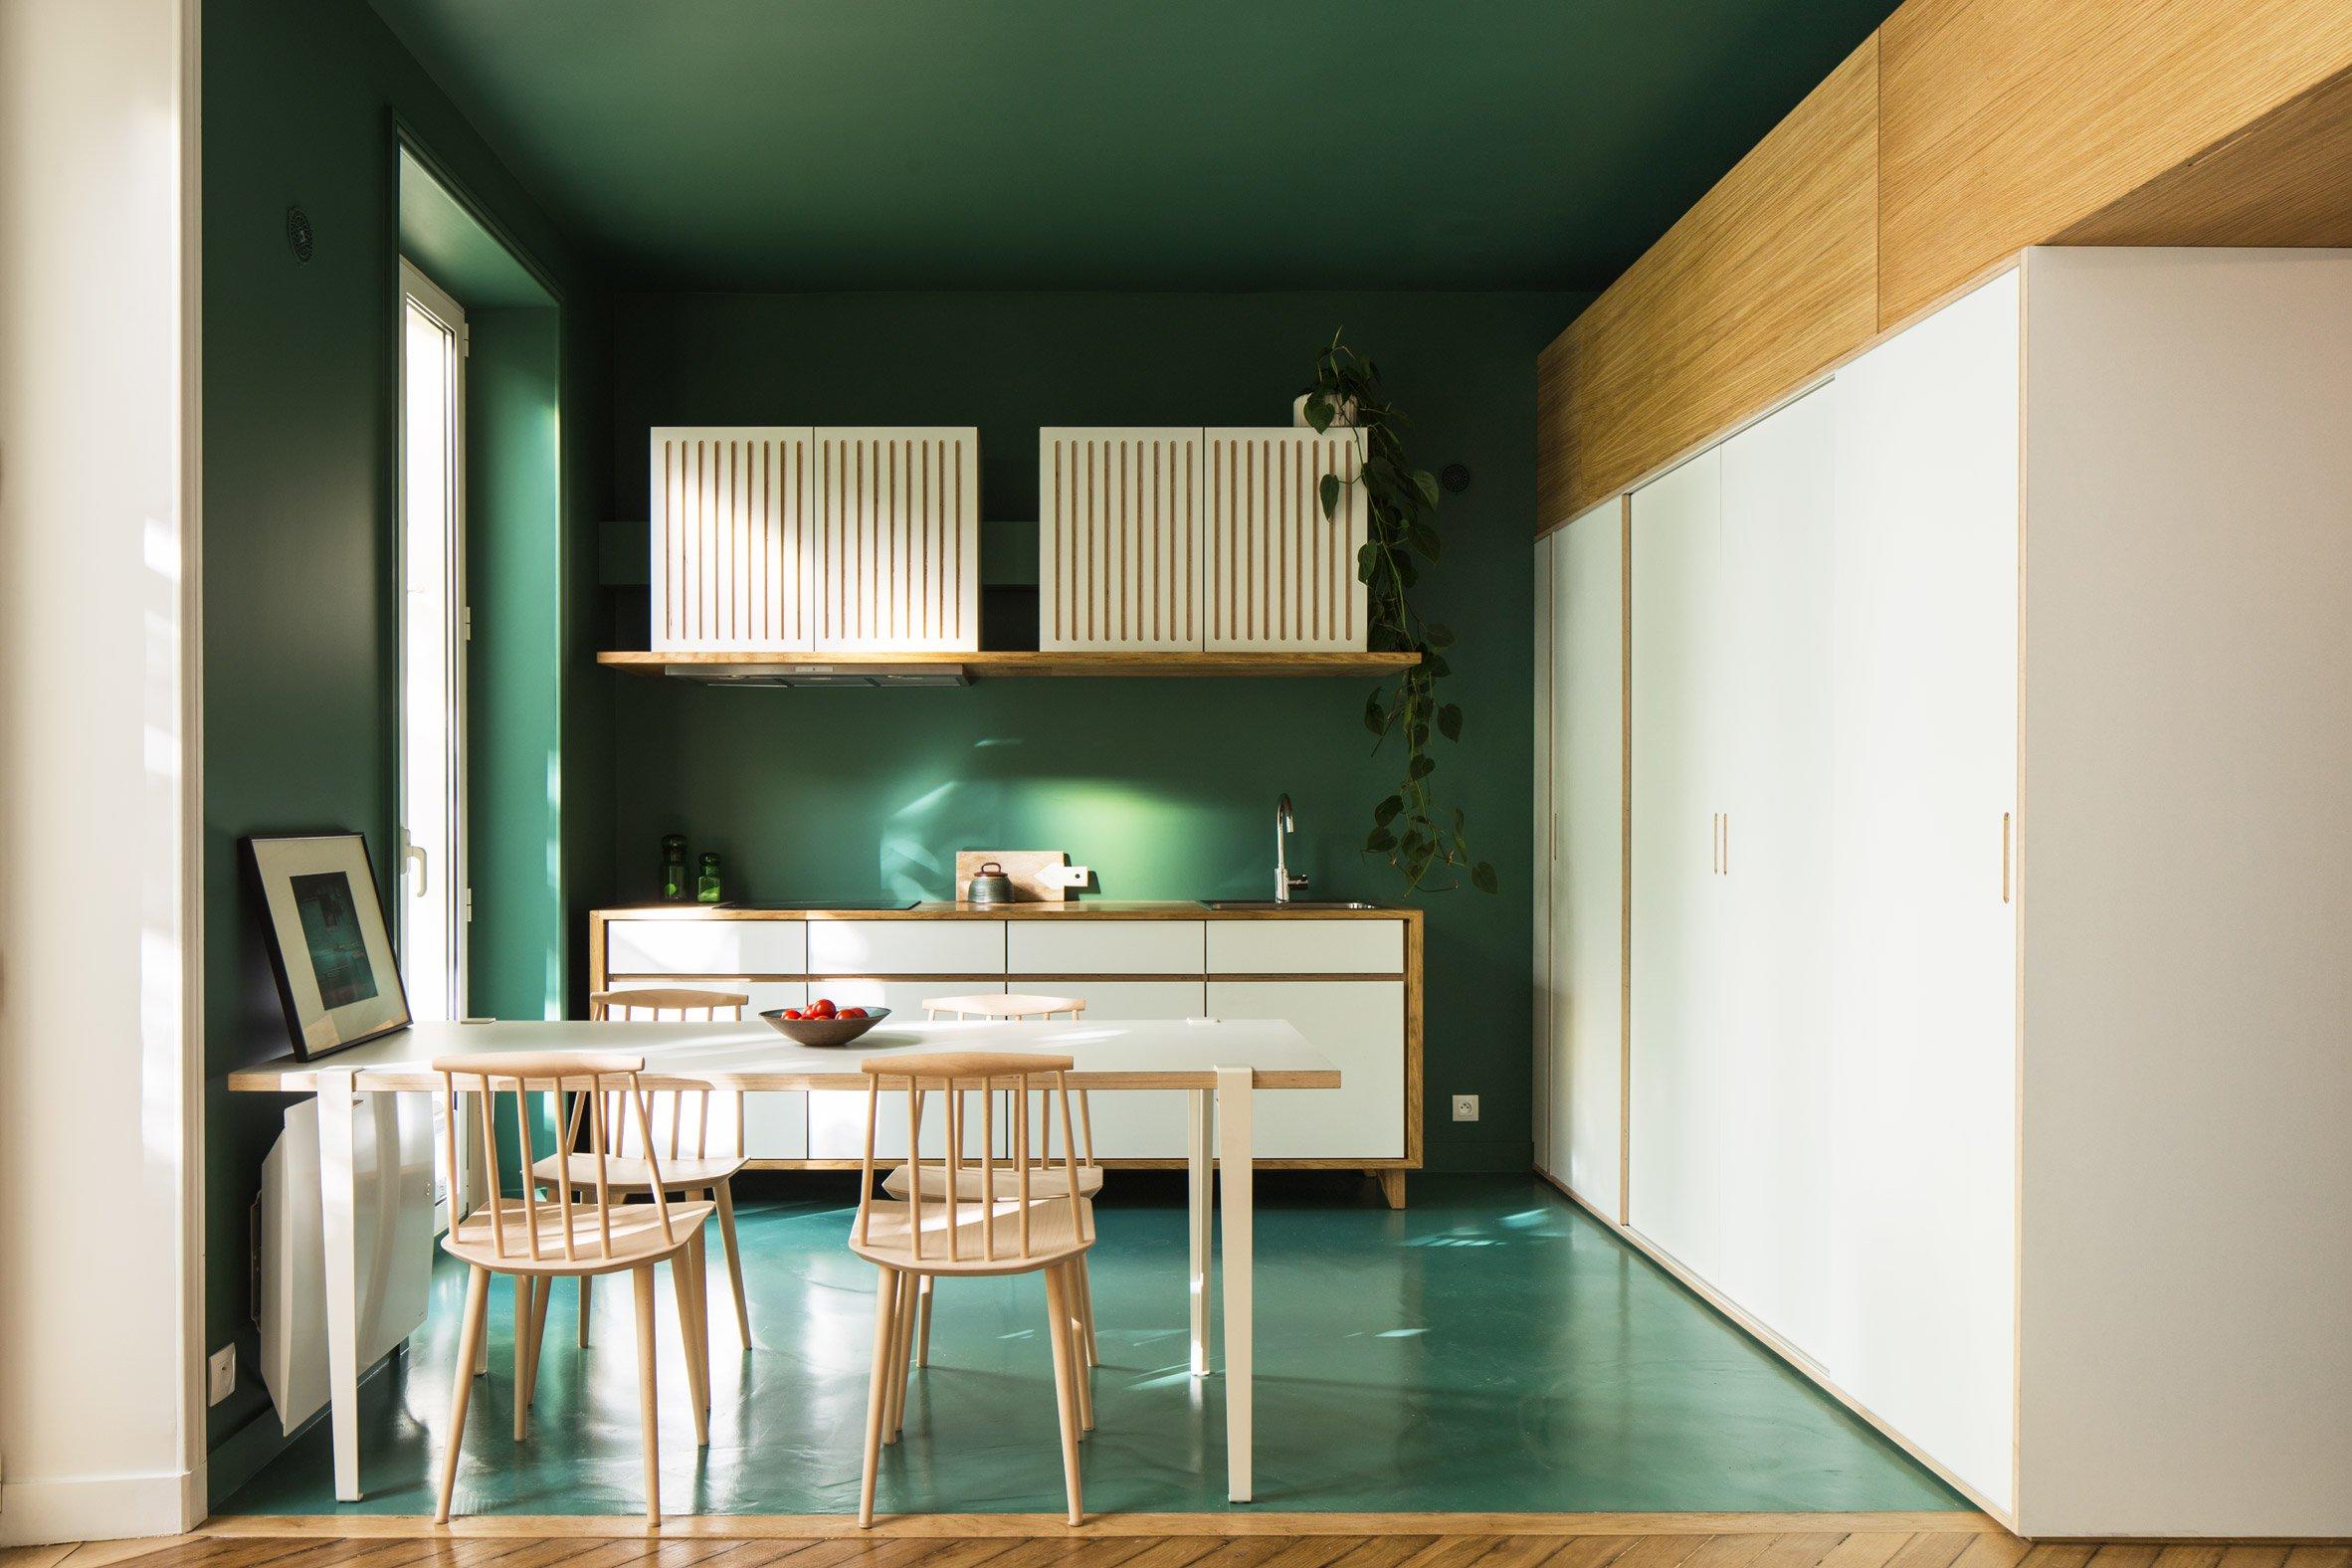 architecture-paris-apartment-design-studia-interiors-osnovadesign-osnova-poltava_03